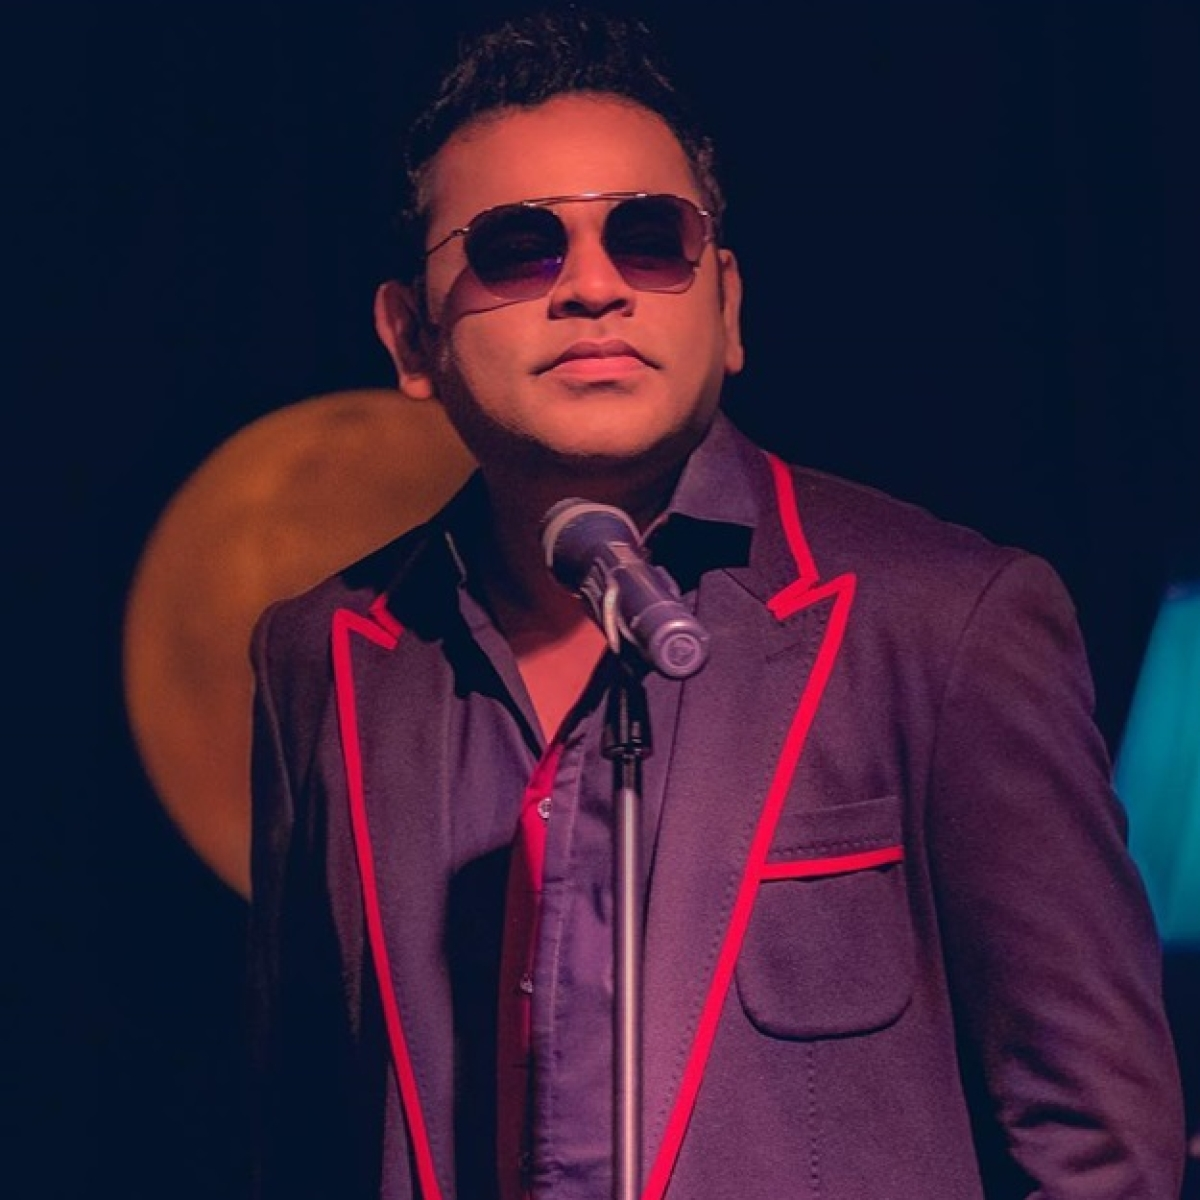 A R Rahman to perform live at Busan International Film Festival 2019